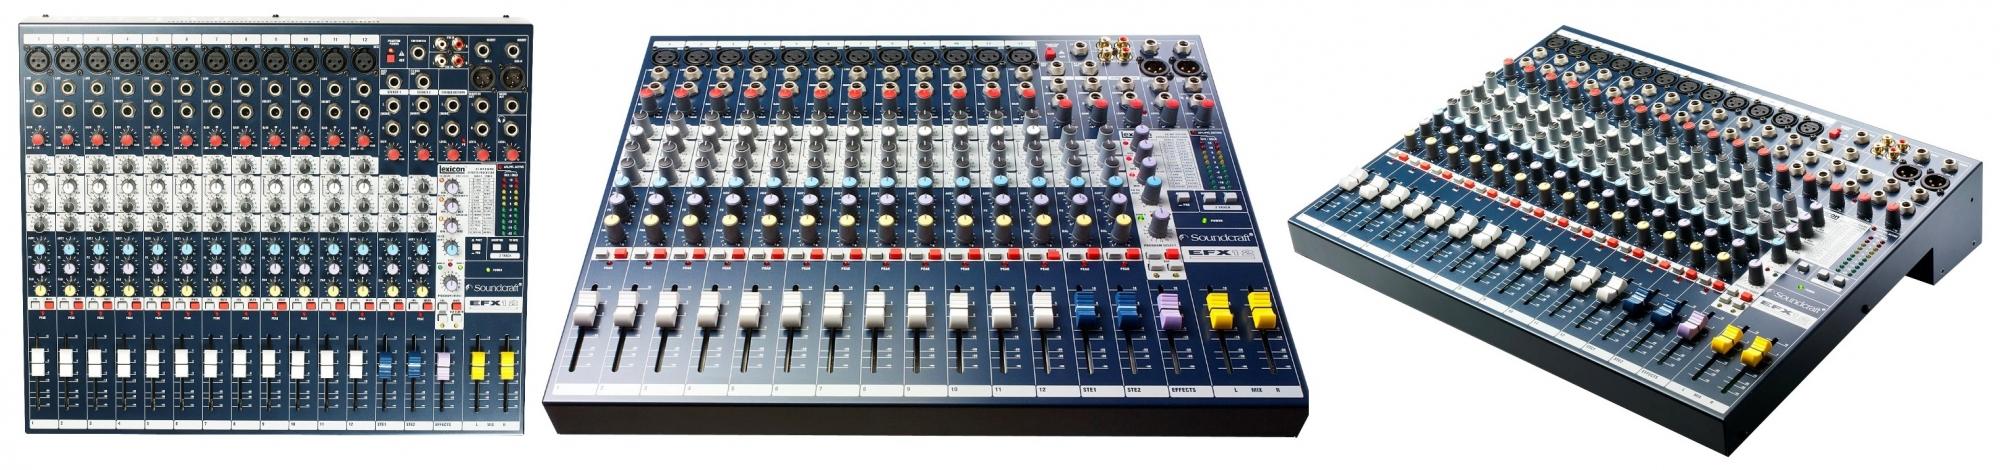 Bàn Mixer Soundcraf EFX12